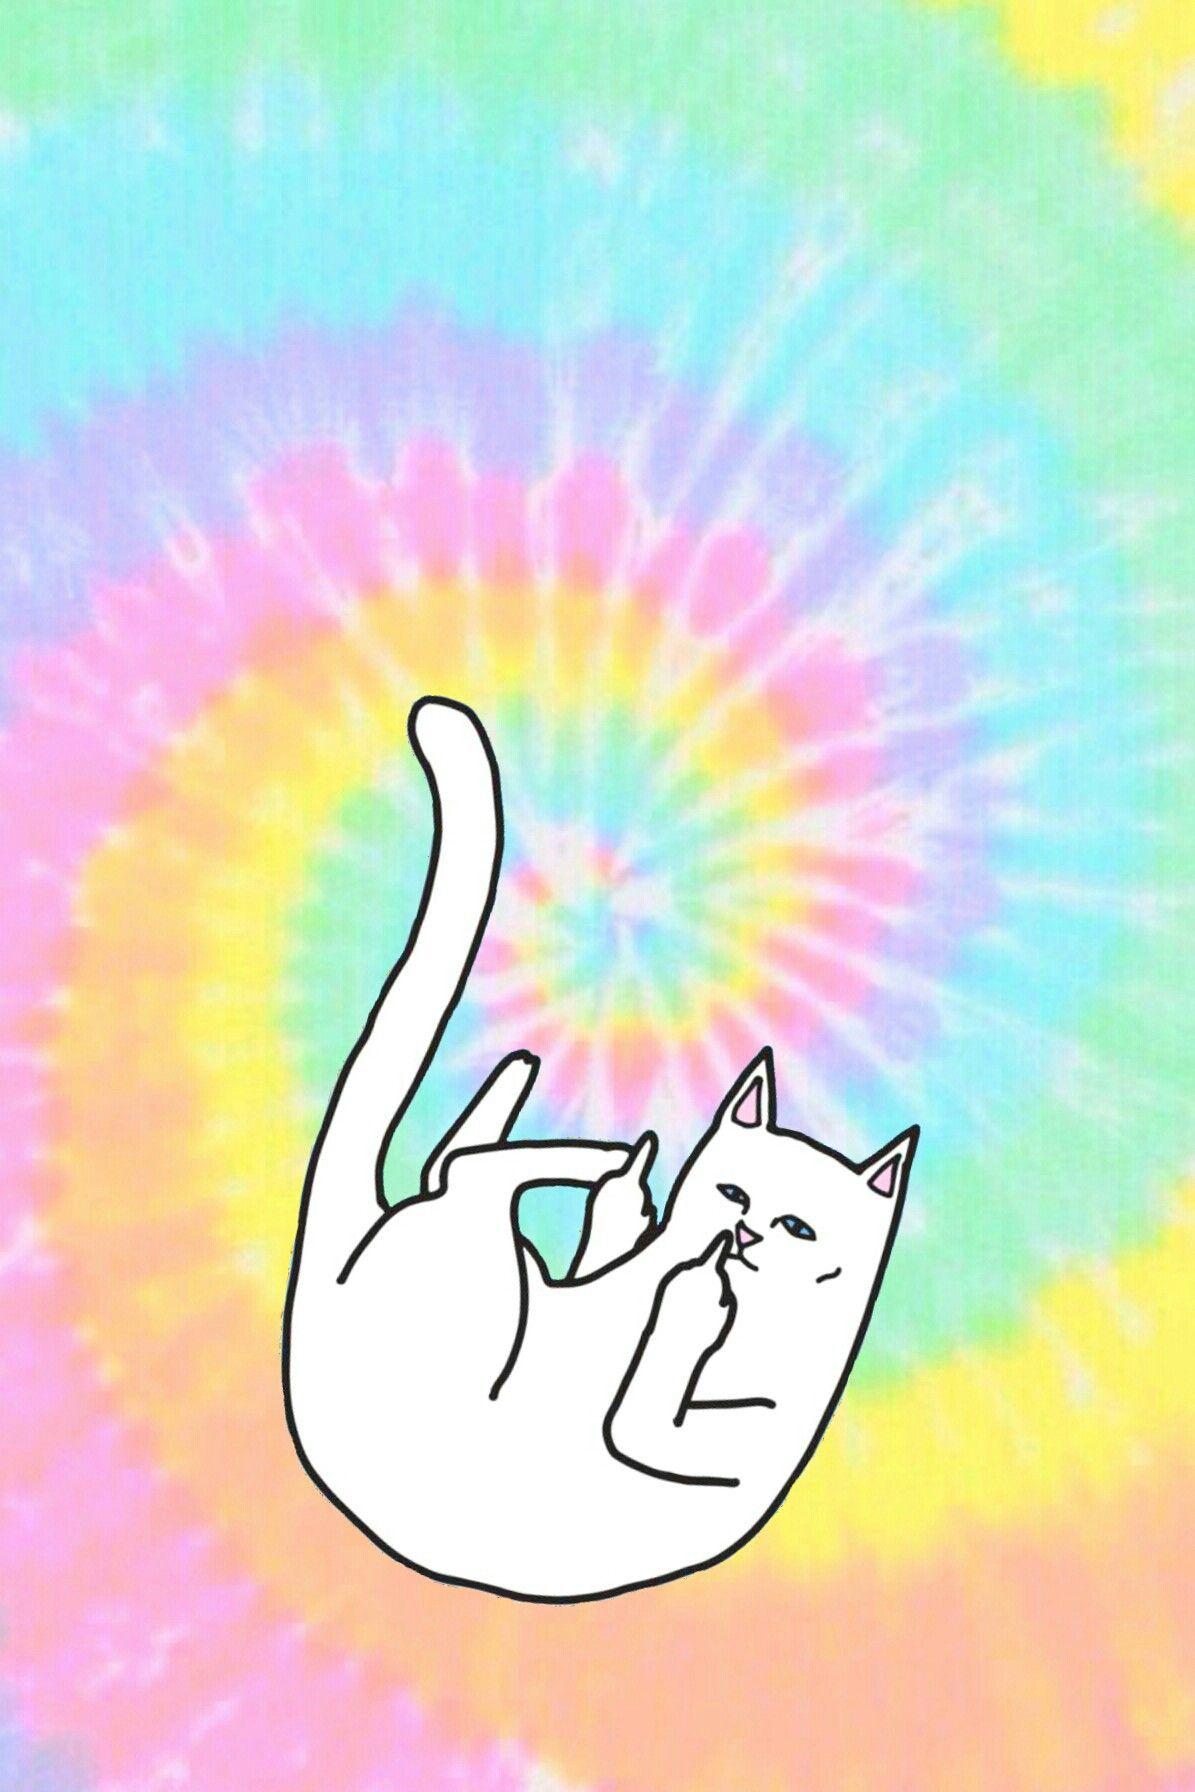 Wallpaper | Middle-Finger Cat | Wallpapers | Fondos para iphone, Fondos de pantalla tumblr e ...